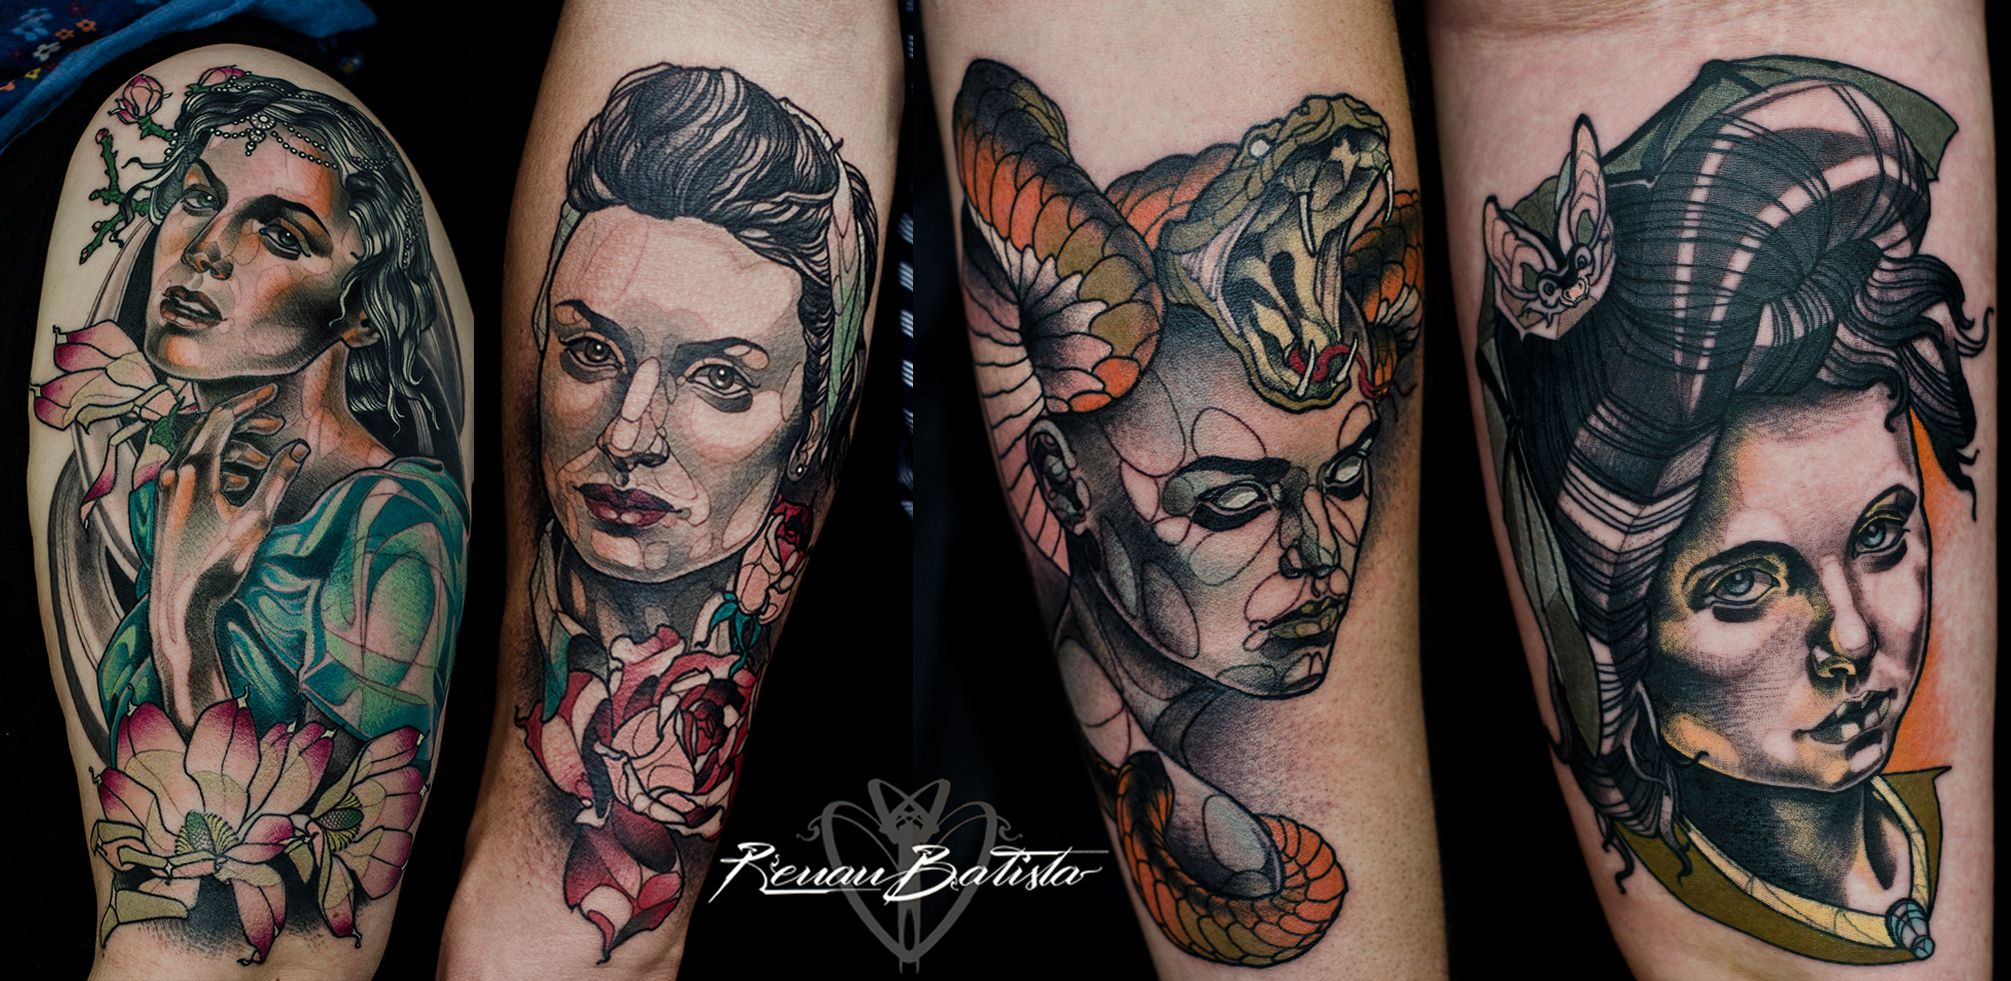 Renan Batista Tattoo